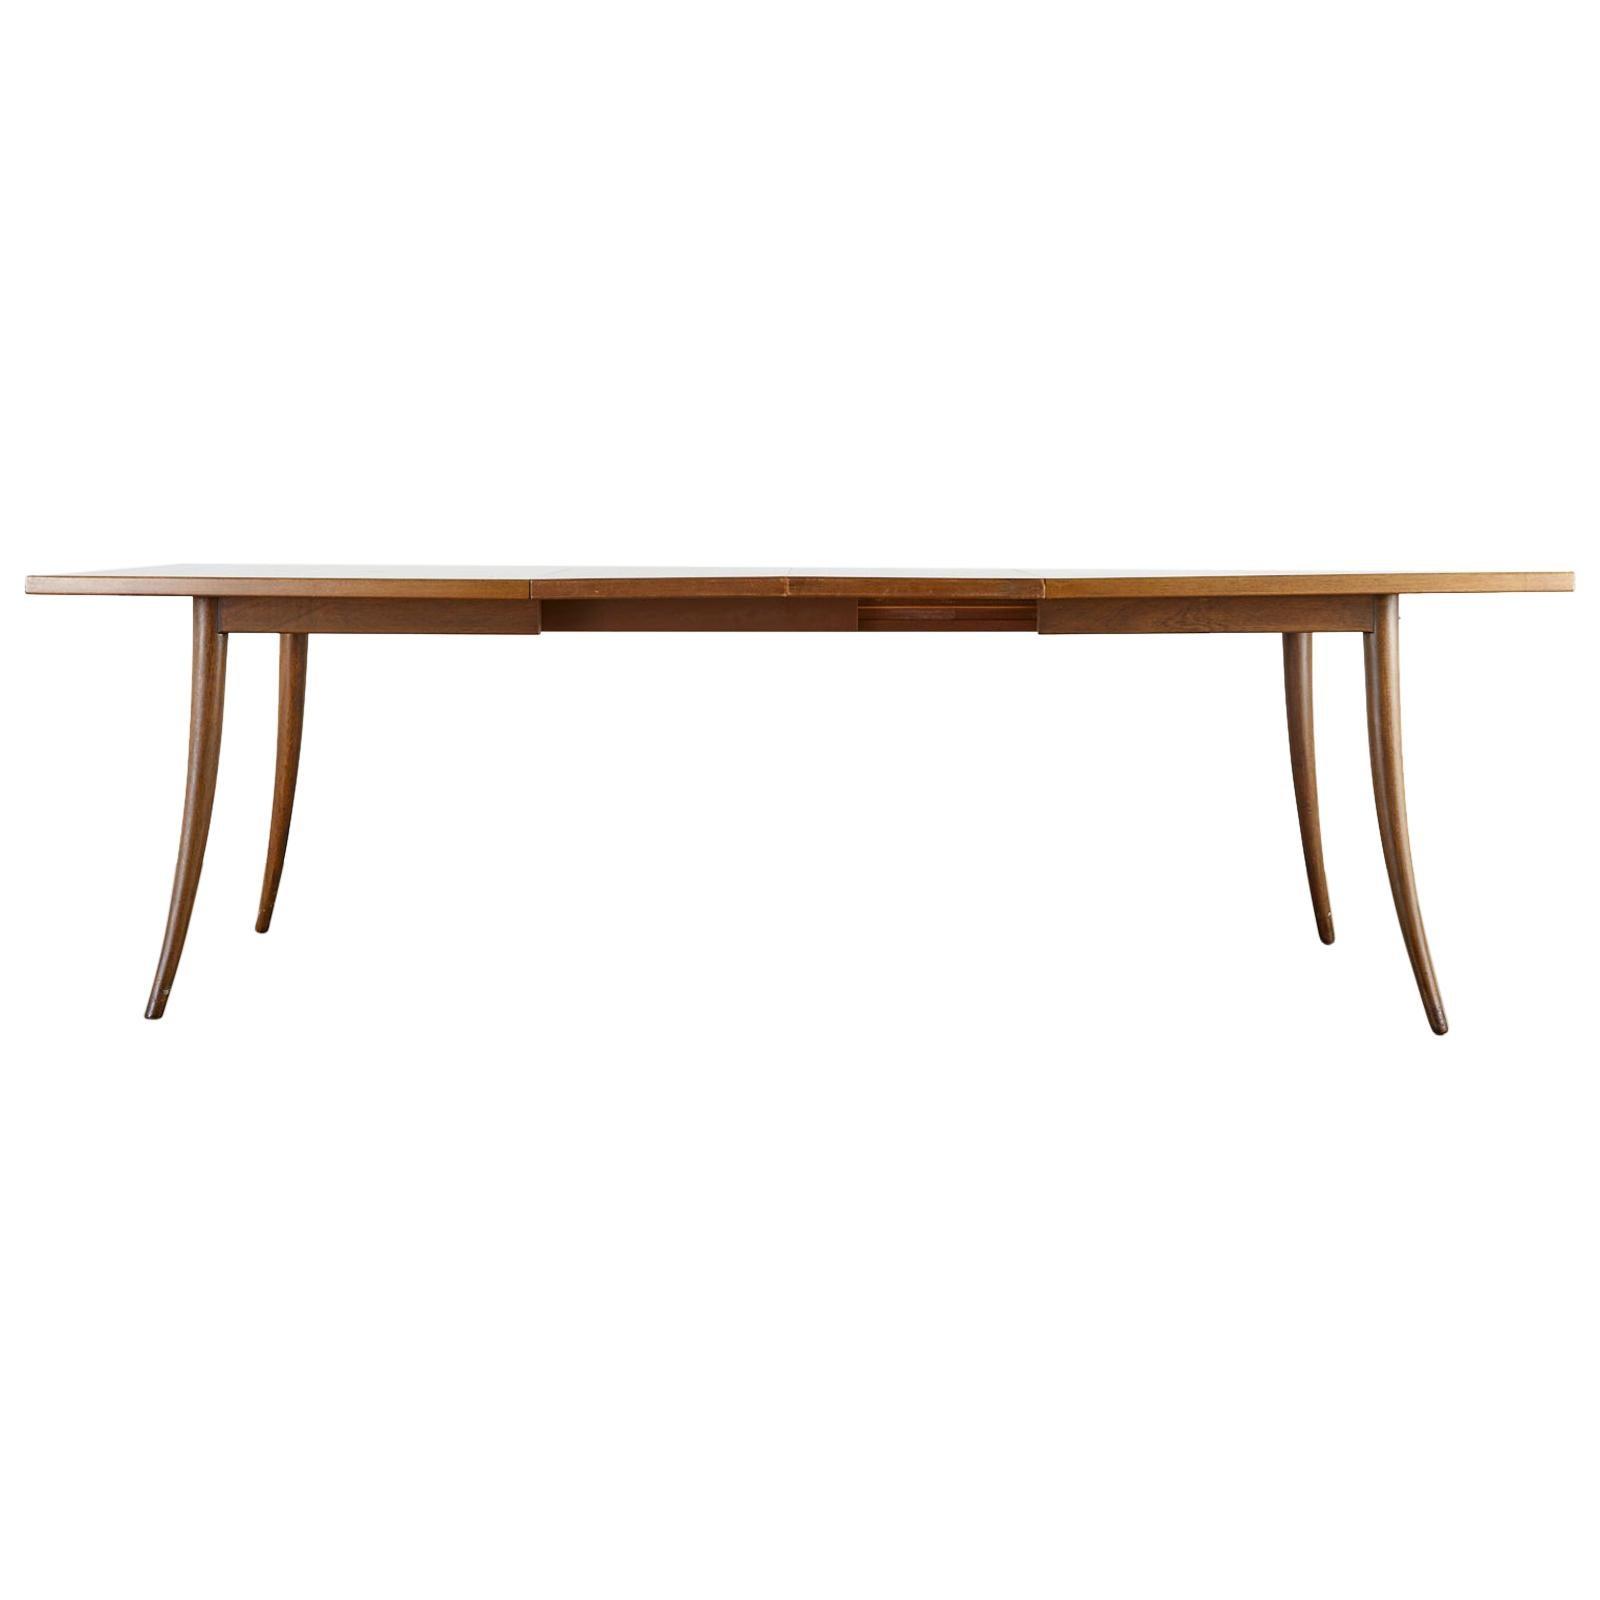 Harvey Probber Midcentury Saber Leg Extension Dining Table